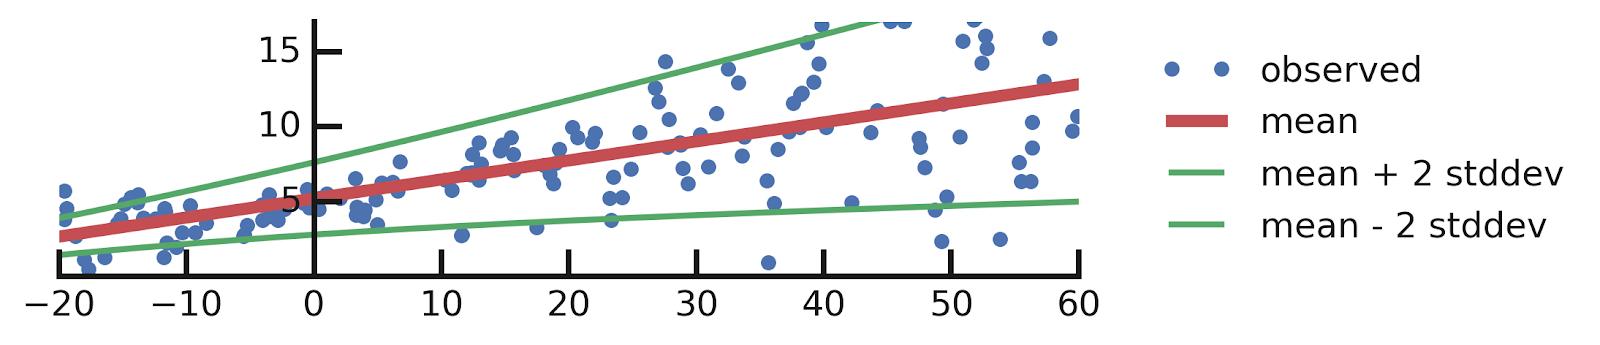 new model graph